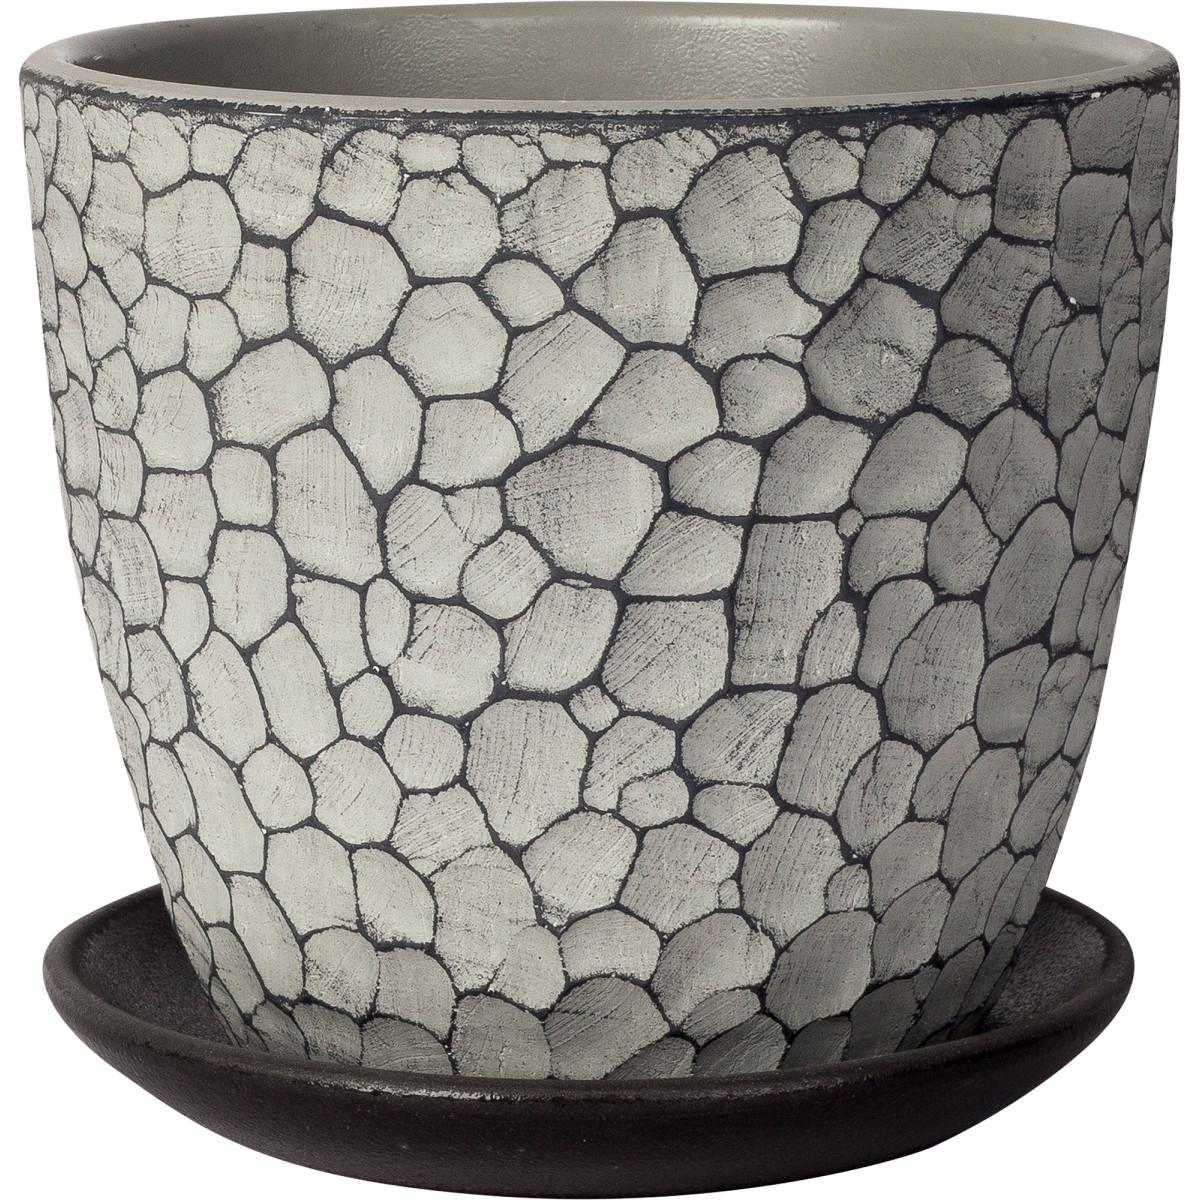 Манго бетон тольятти бетон крекшино